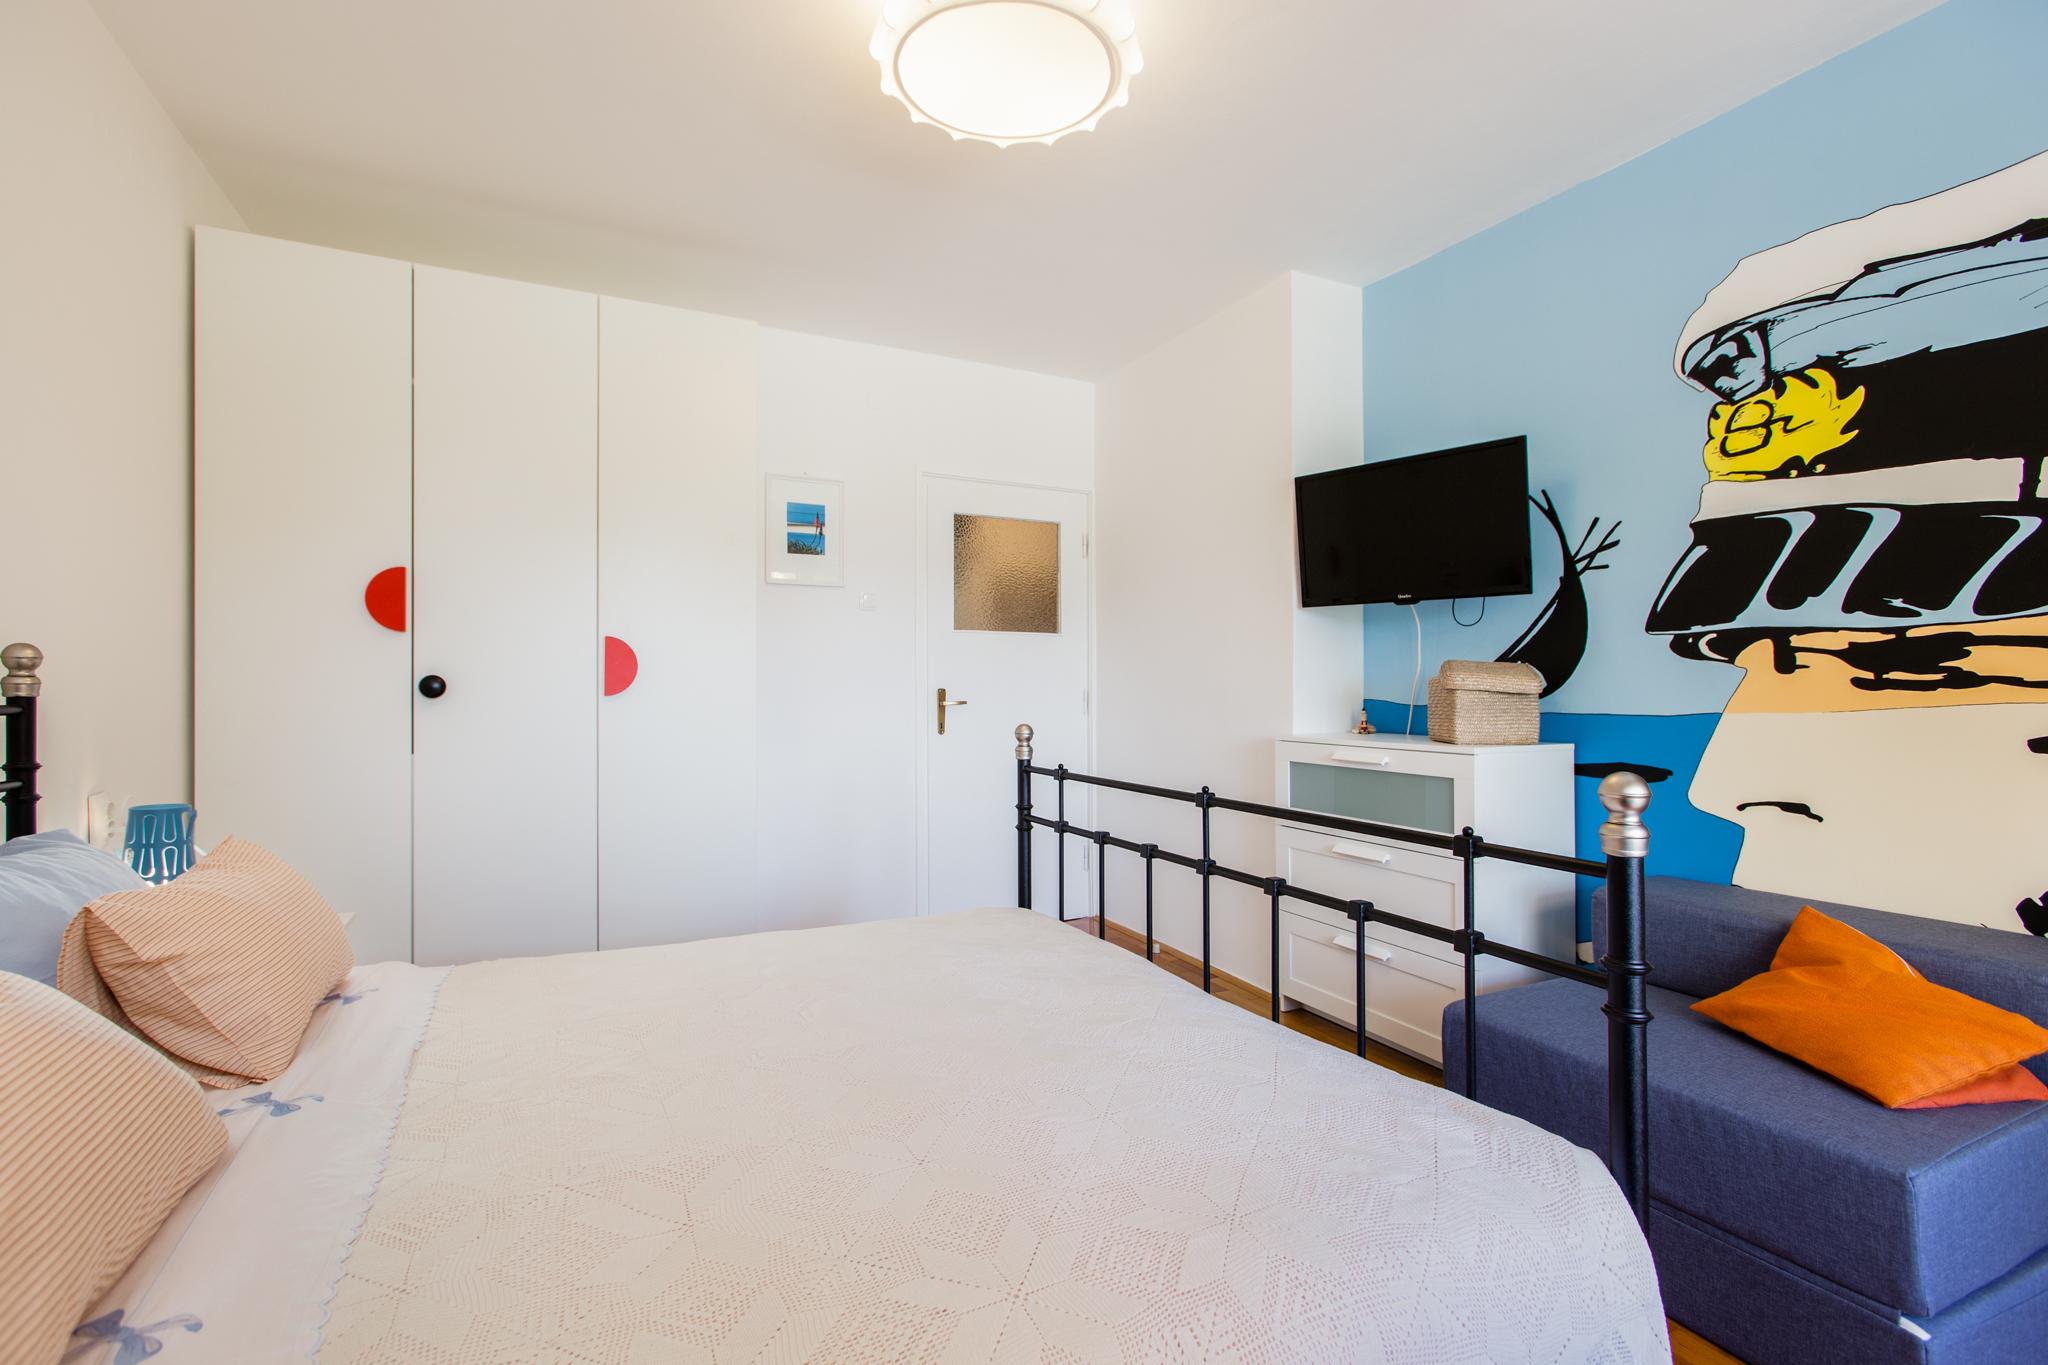 Apartment Split - Corto Maltese (6)